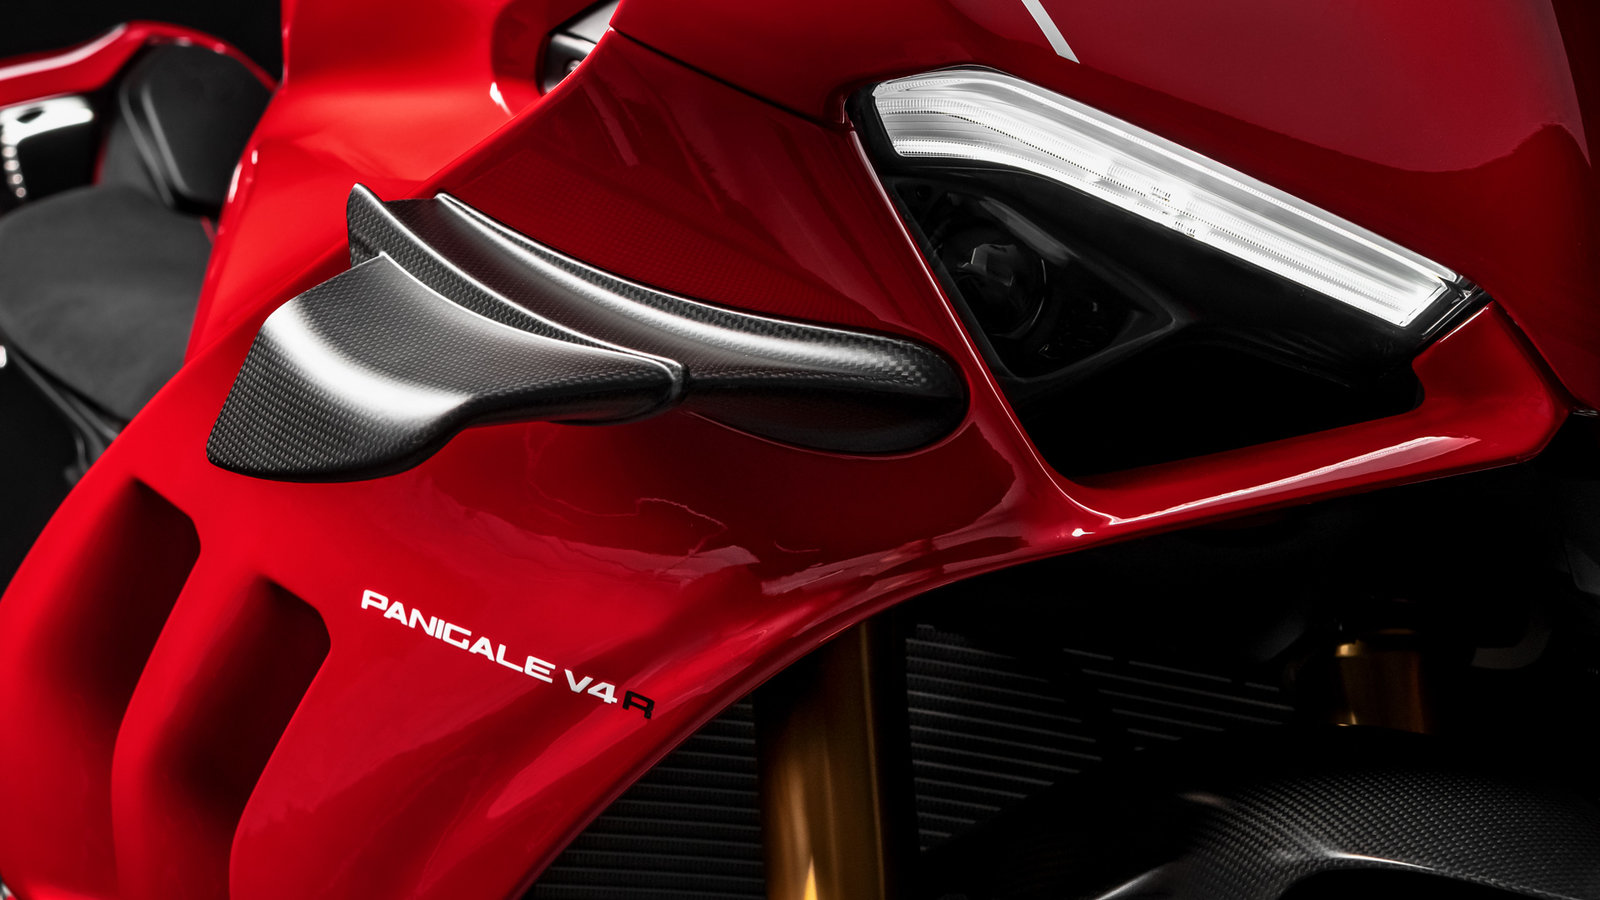 Panigale-V4R-Red-MY19-09-Gallery-1920x1080.jpg